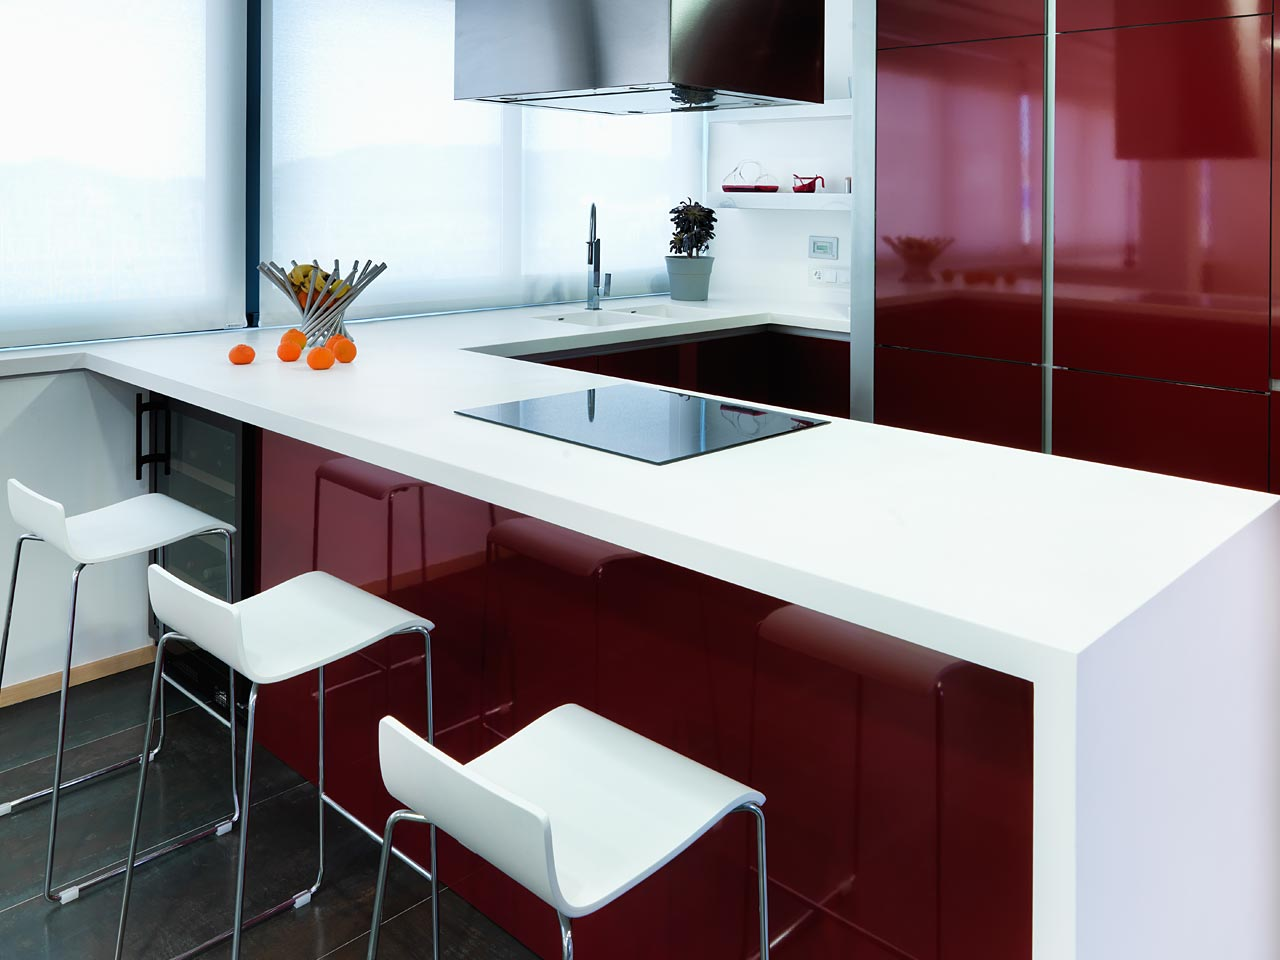 ... Kitchen Worktops Plans DIY plans octagon picnic table | jaewooding100